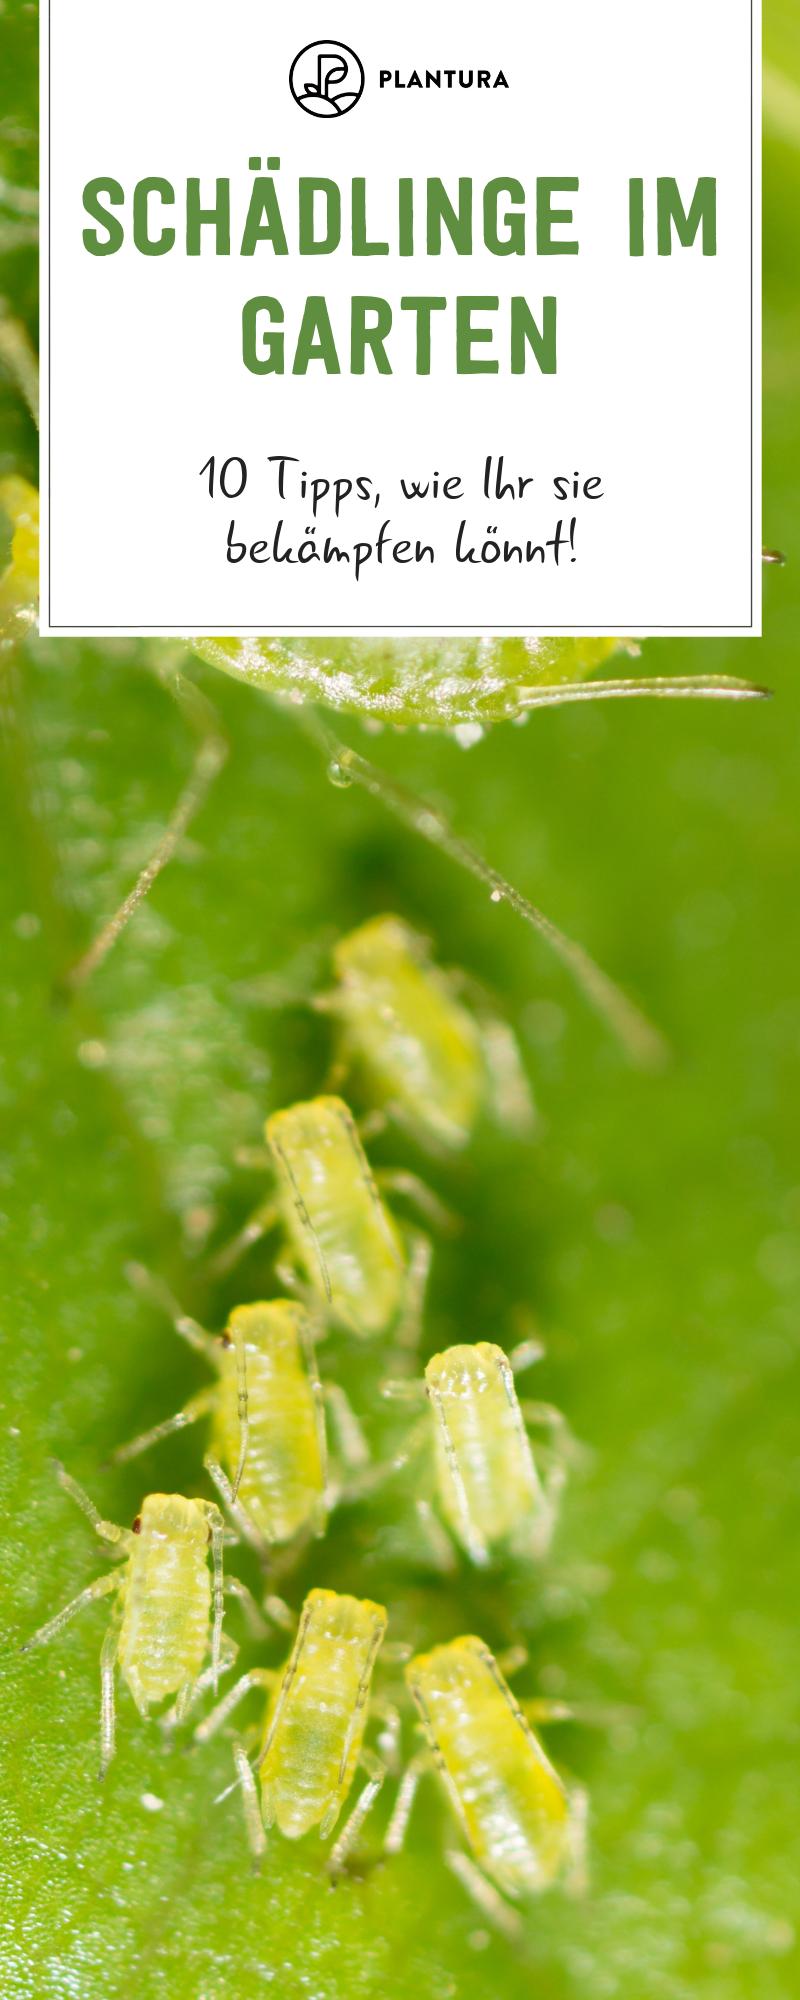 10 Hausmittel Gegen Schadlinge Im Garten Schadlinge Im Garten Ameisen Im Garten Garten